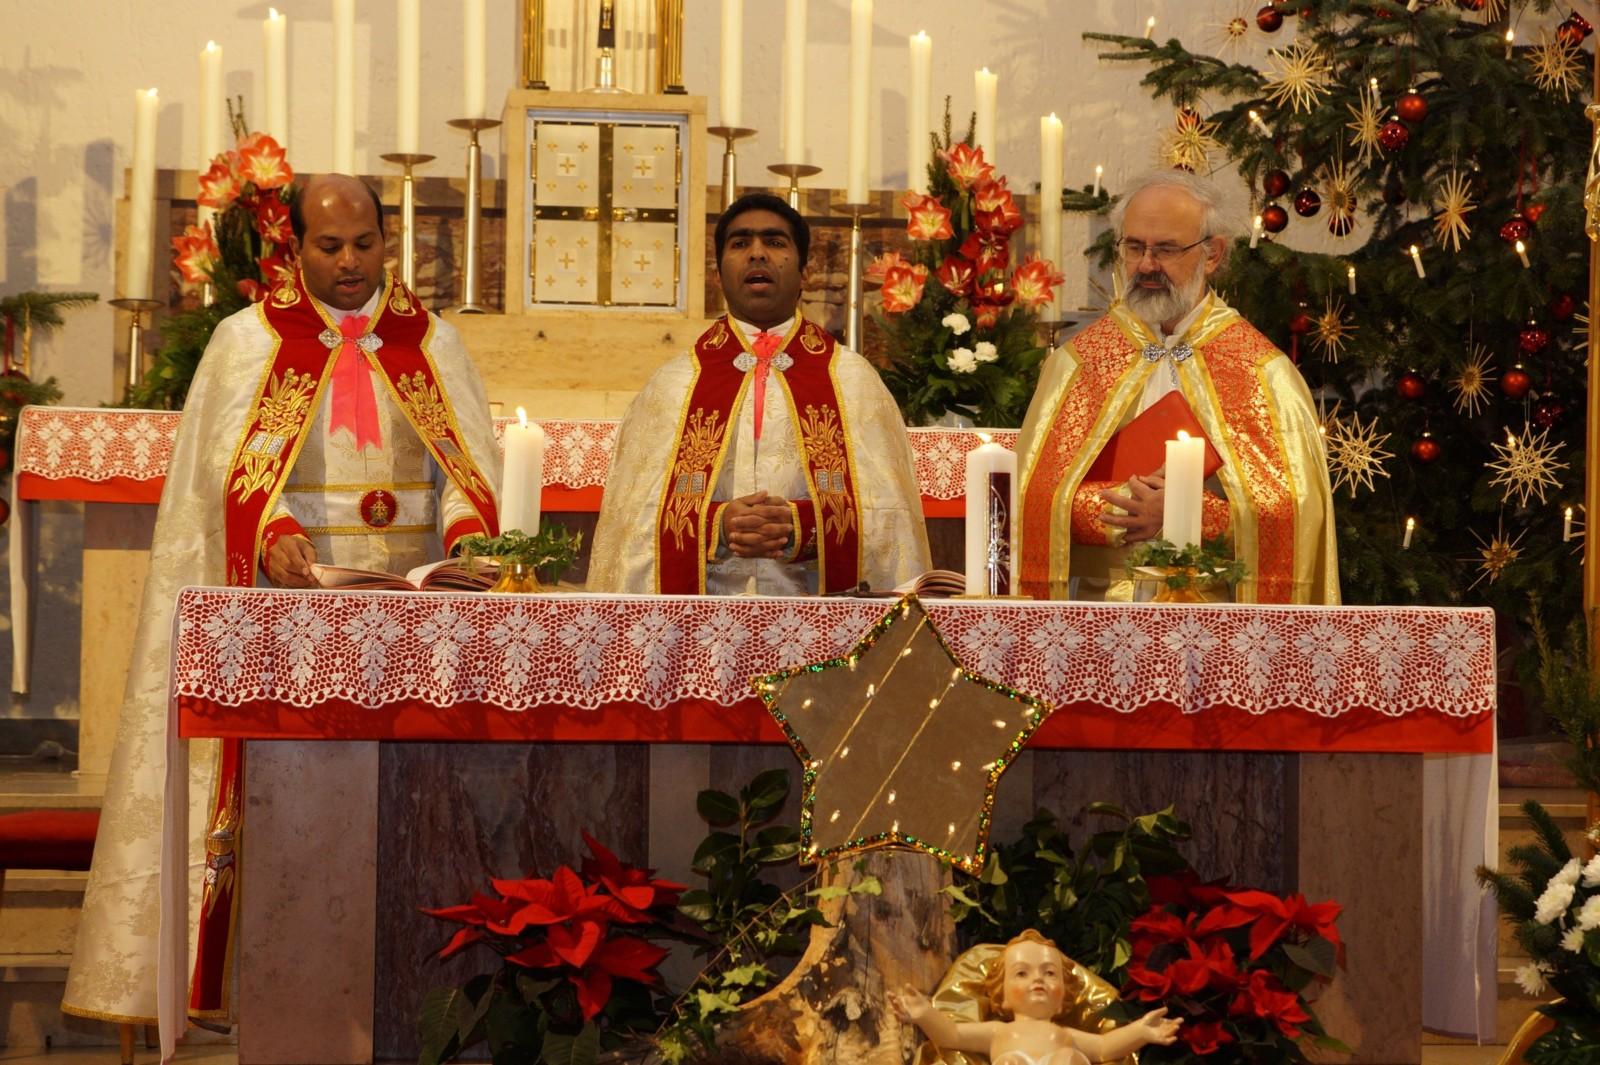 20181230-10 Jahre Priester Joseph DSC03751